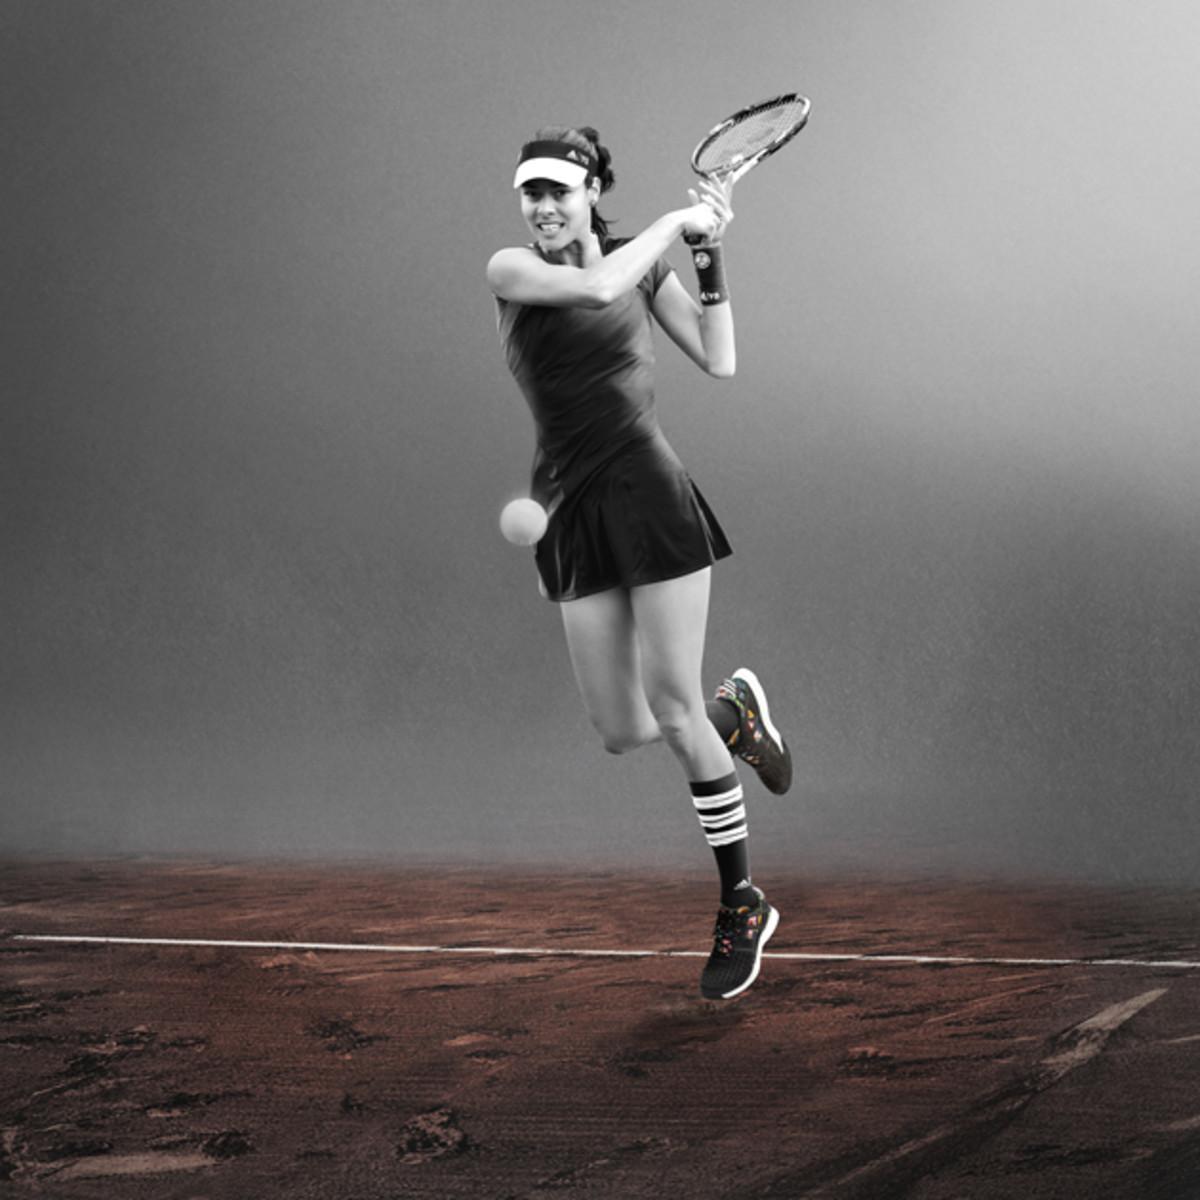 ana-ivanovic-adidas.jpg